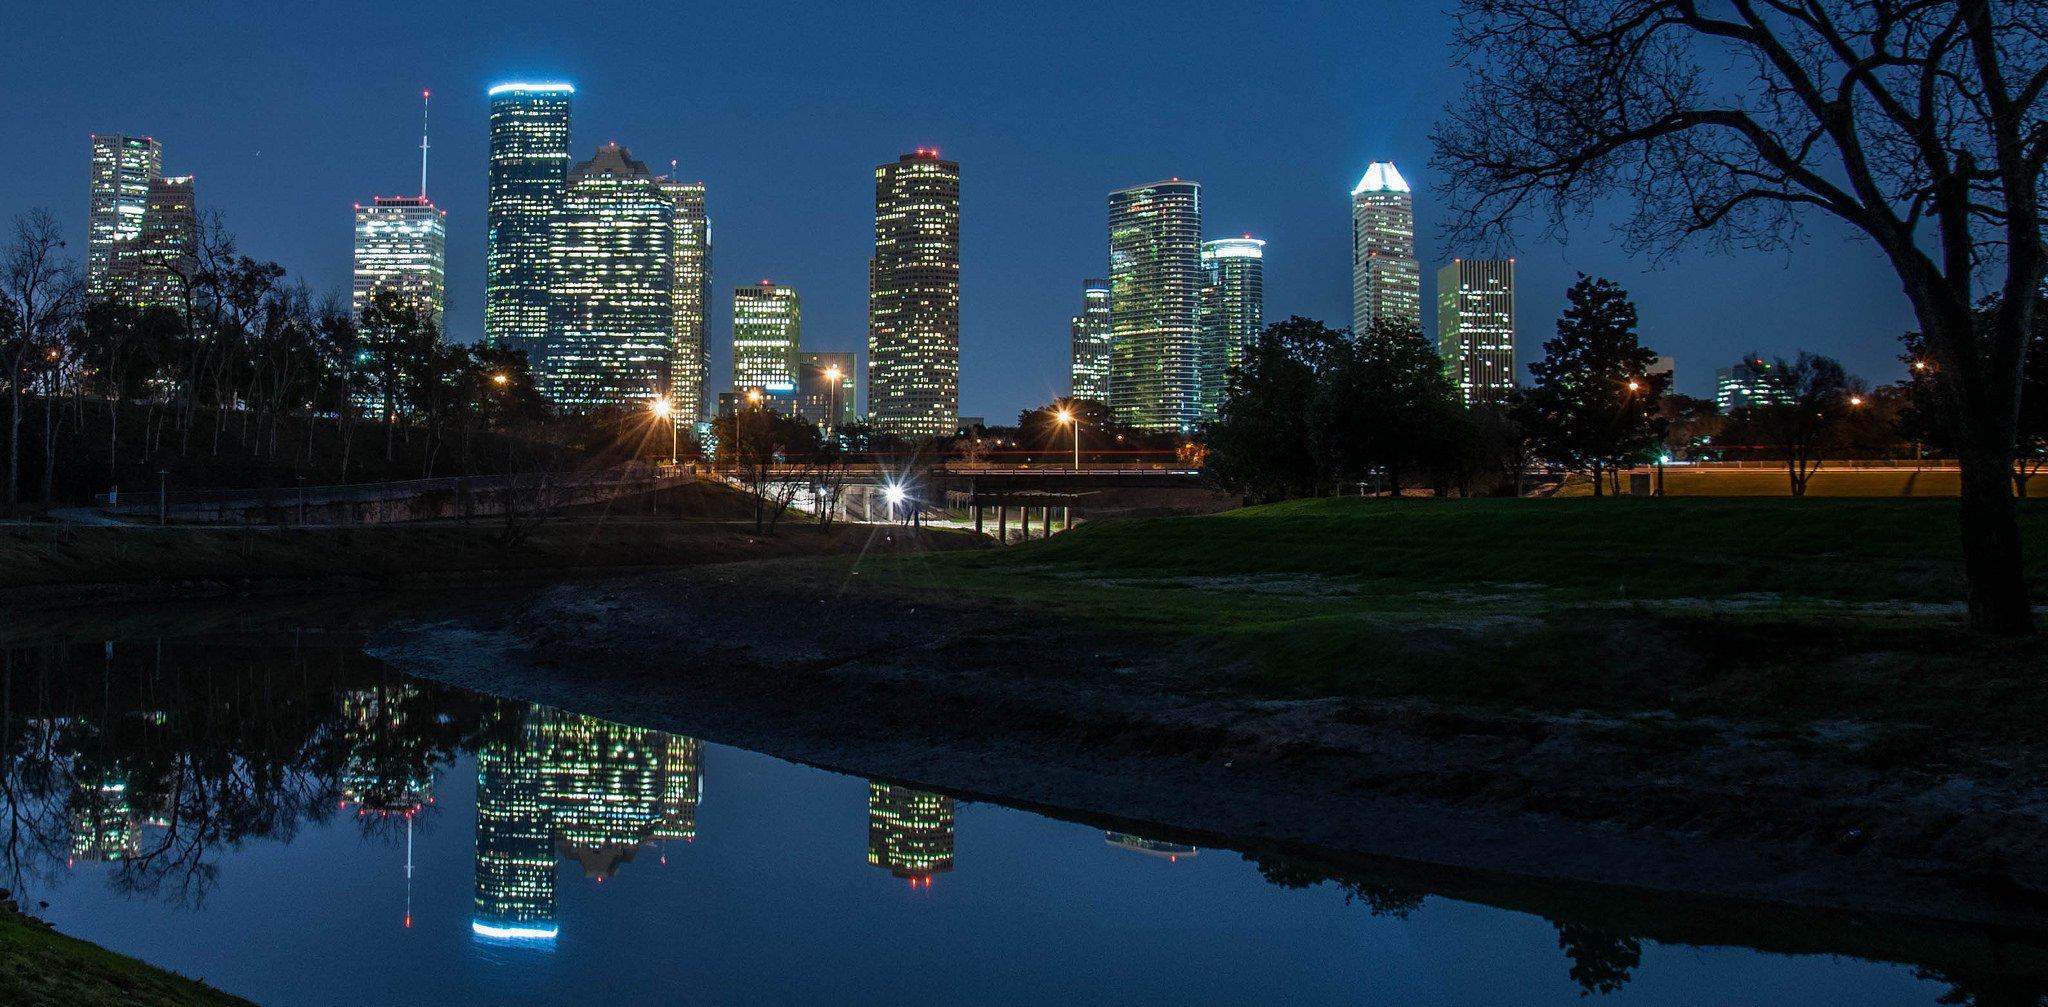 Houston architecture bridges cities City texas Night towers buildings 2048x1007